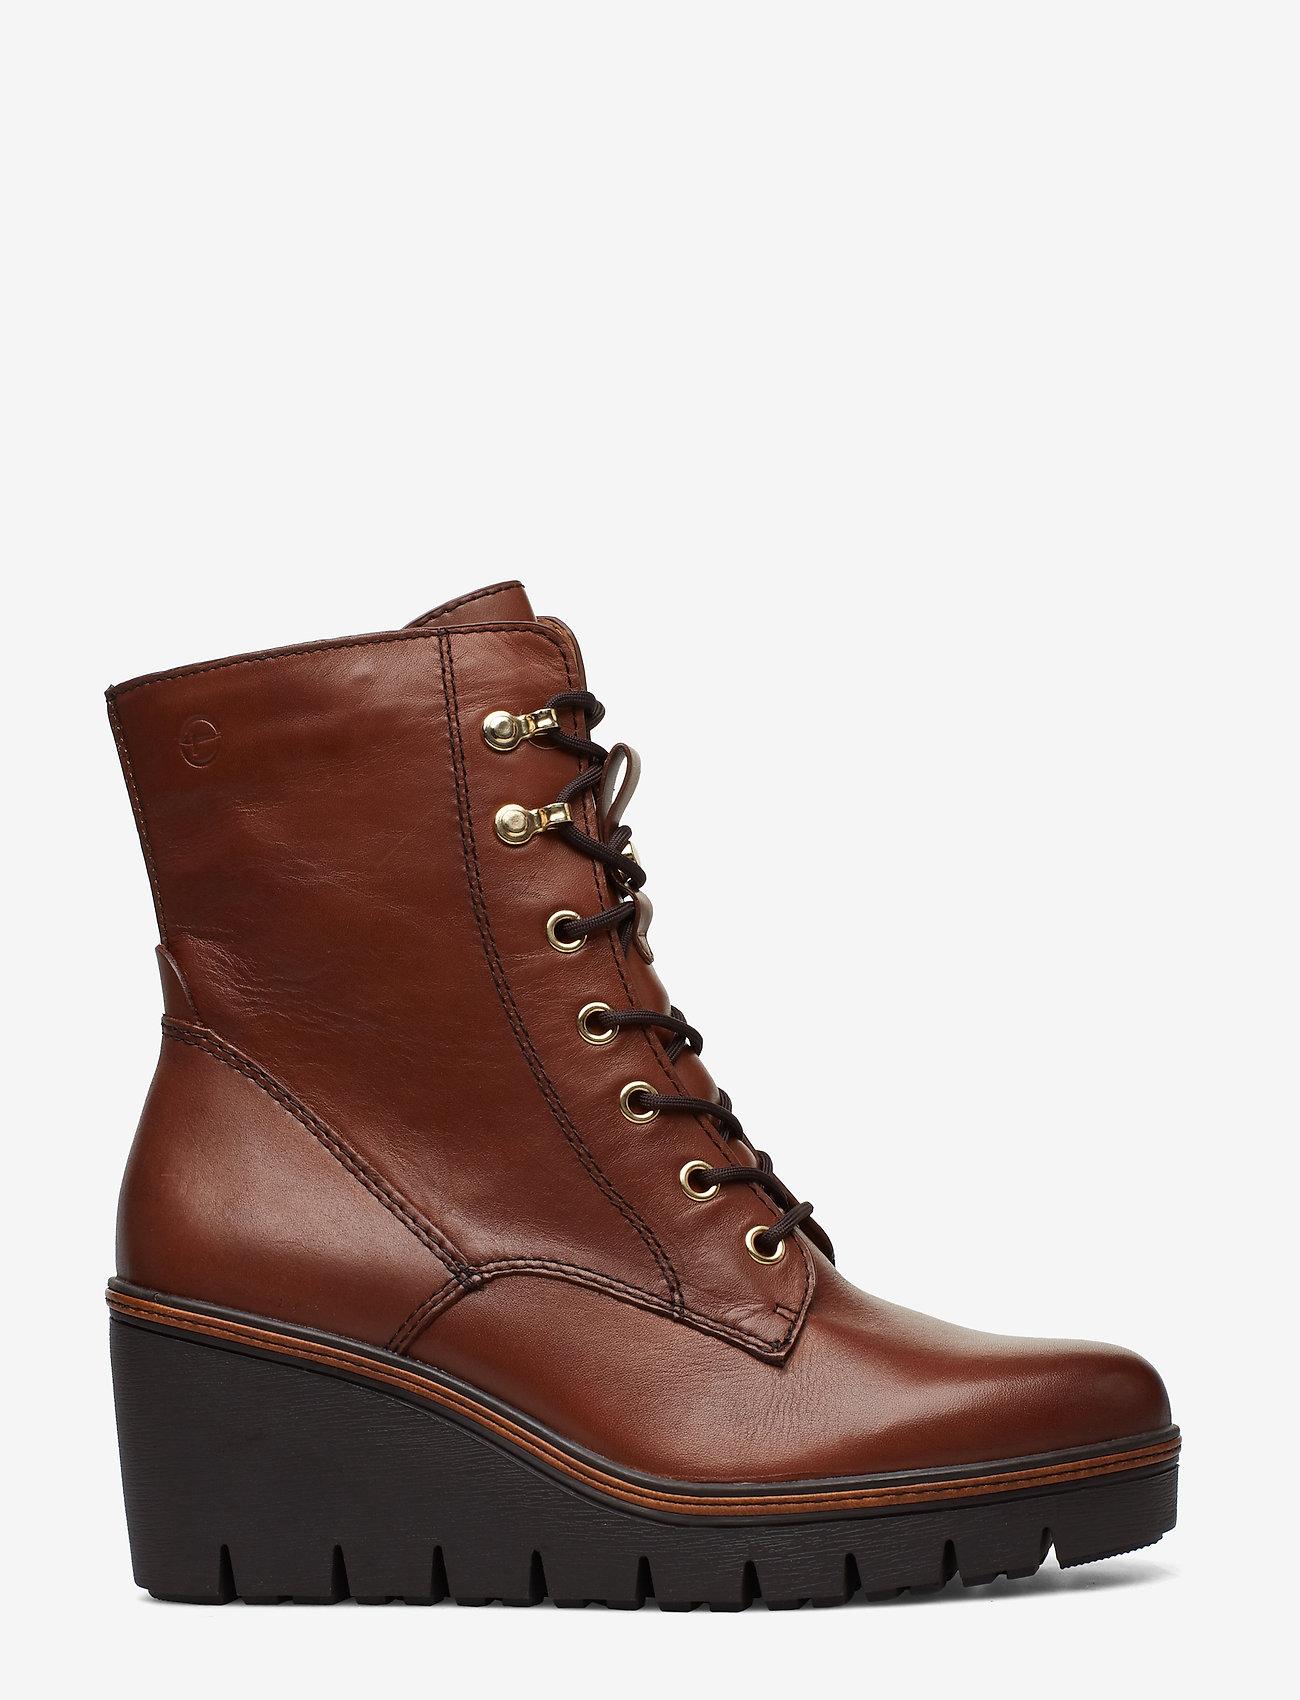 Woms Boots (Cognac) - Tamaris QqBmZO